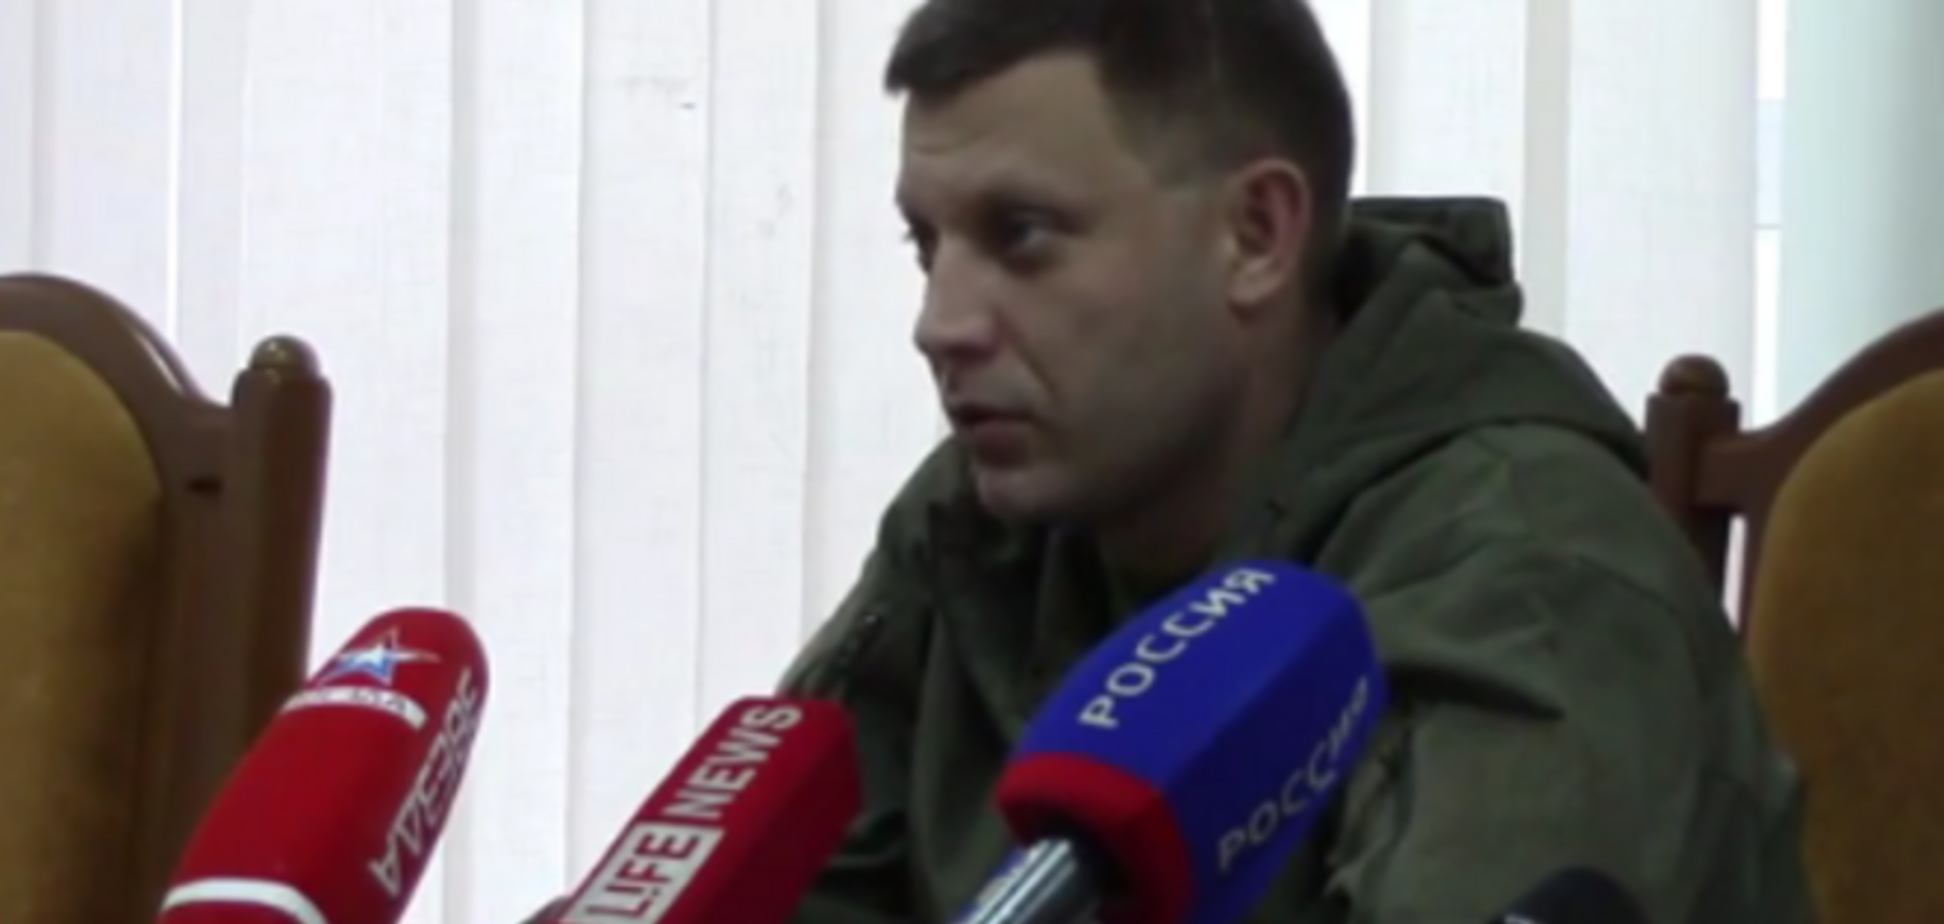 Главарь 'ДНР' Захарченко 'национализирует' компанию Януковича: опубликовано видео